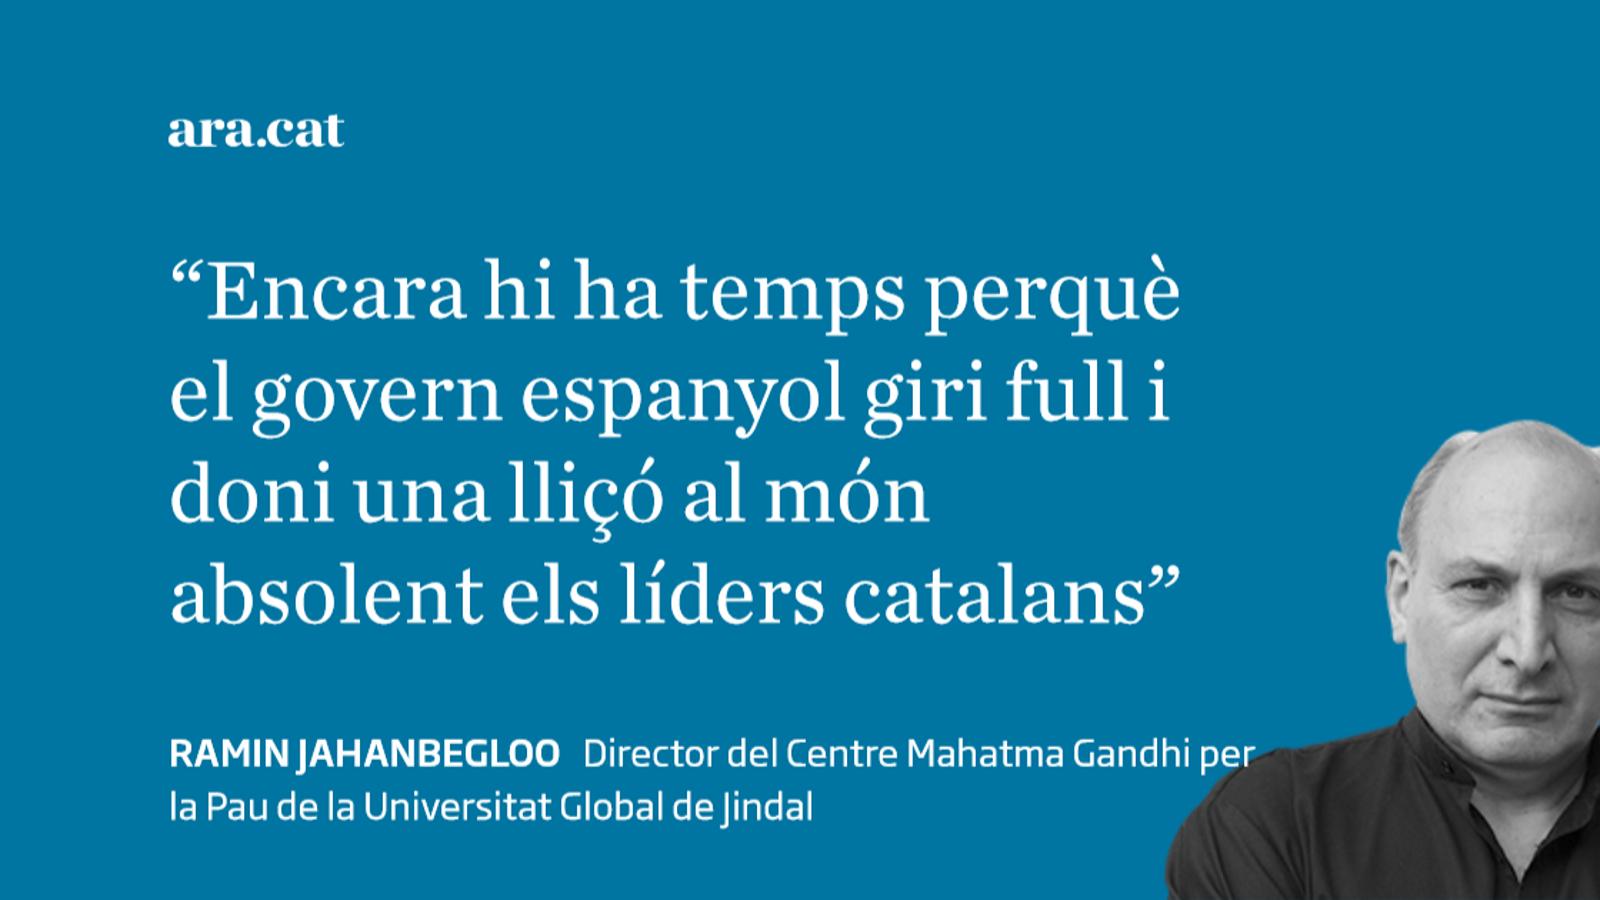 Testimonis de la justícia a Catalunya